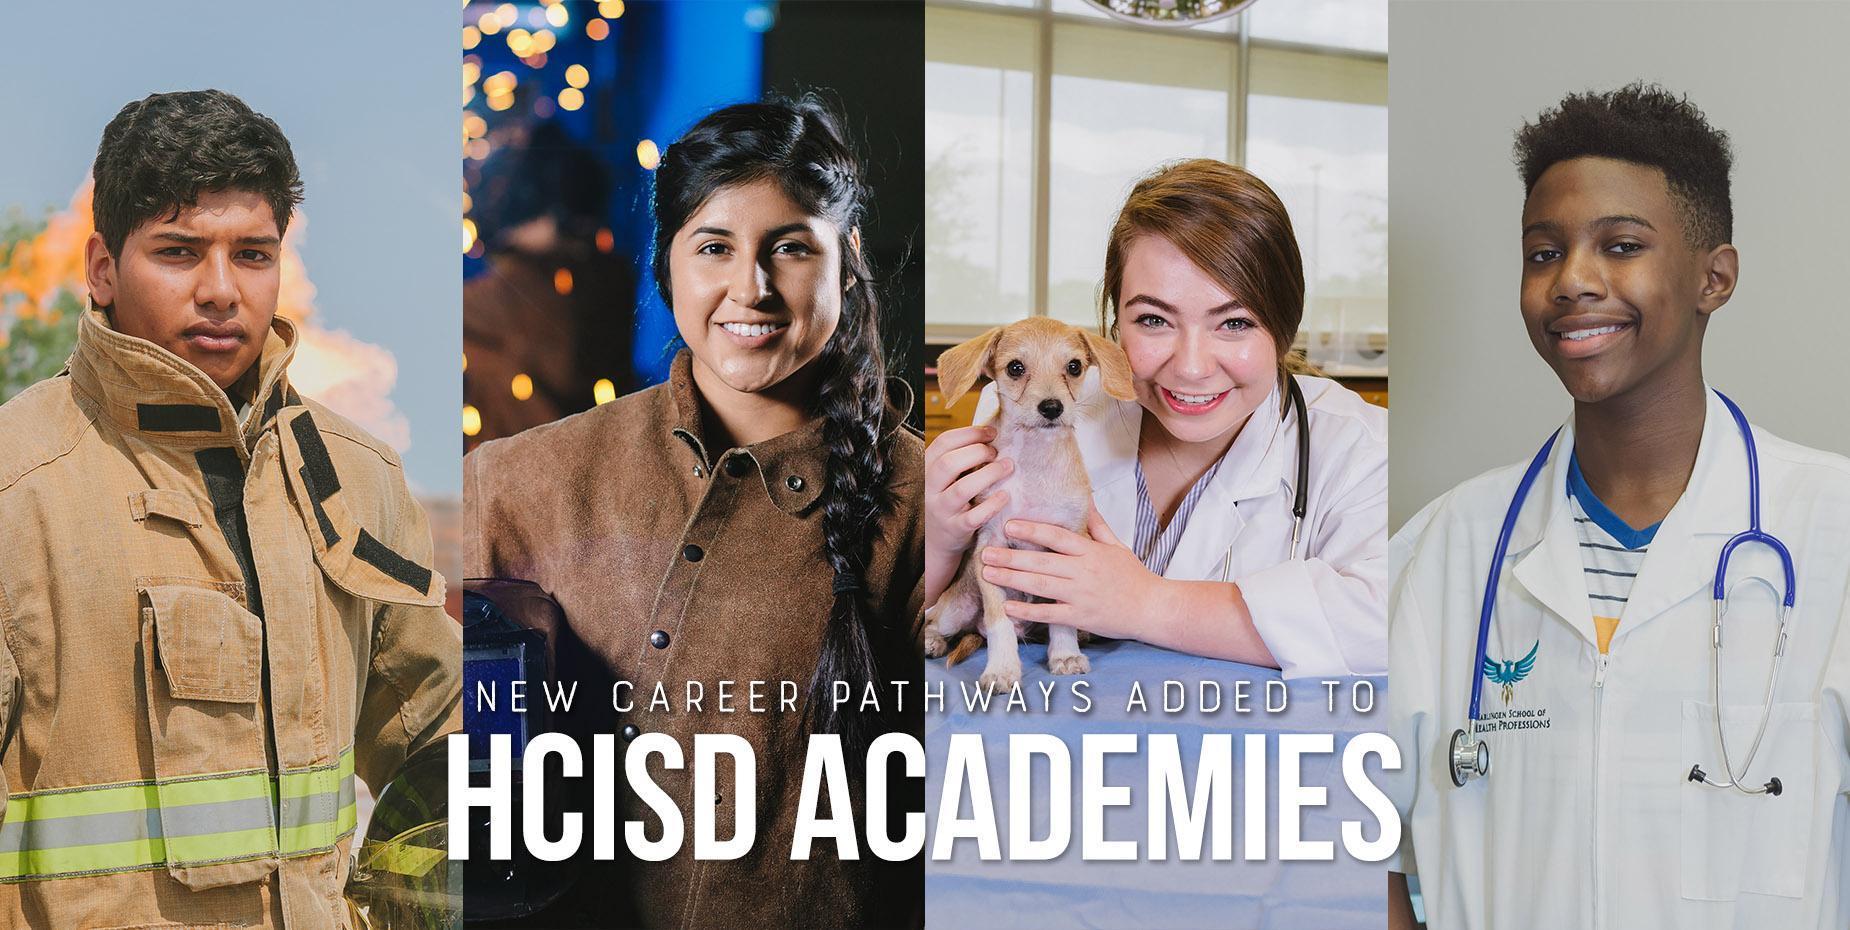 New career pathways added to HCISD Academies